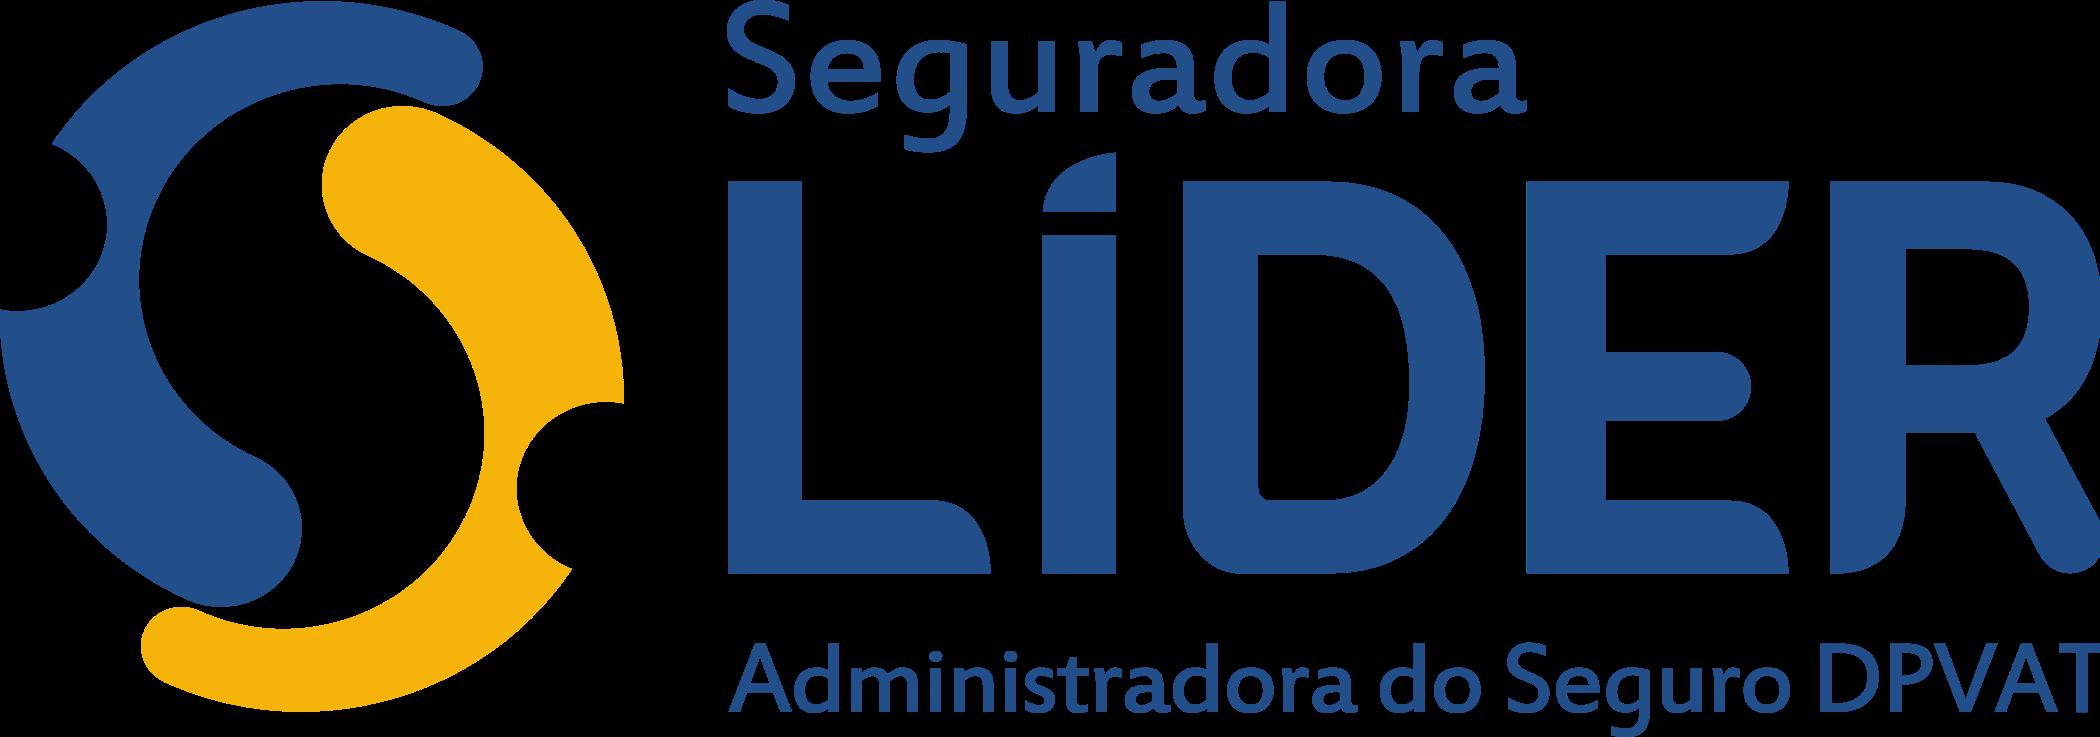 seguradora lider dpvat logo 1 - Seguradora Líder Logo (DPVAT)